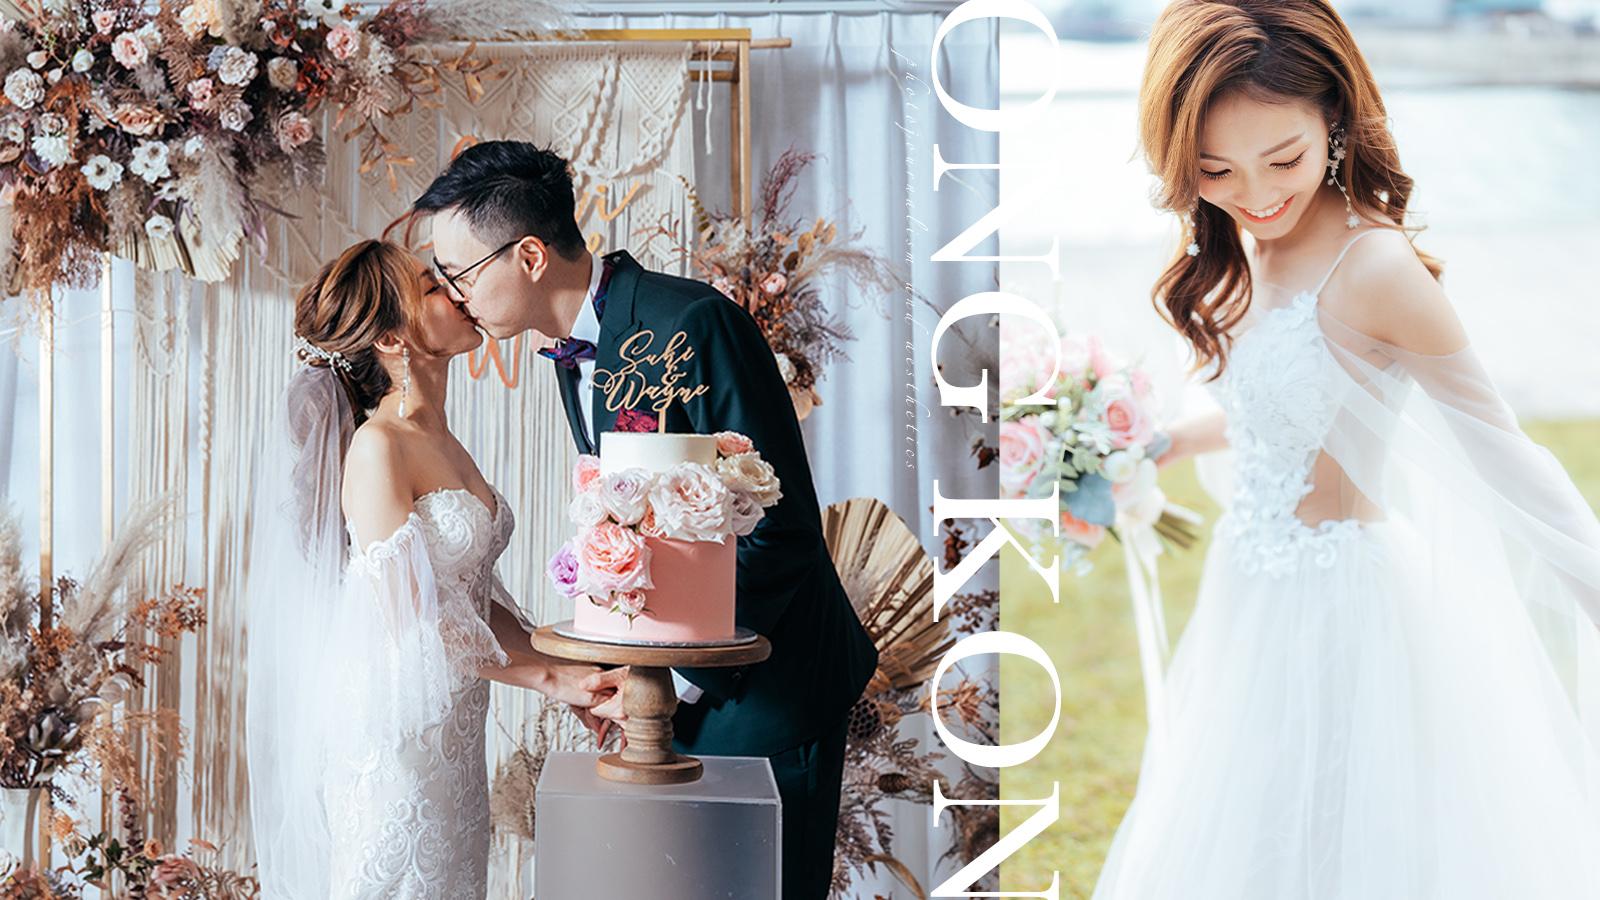 【許願樹】 HK Wedding Photography 香港婚禮攝影